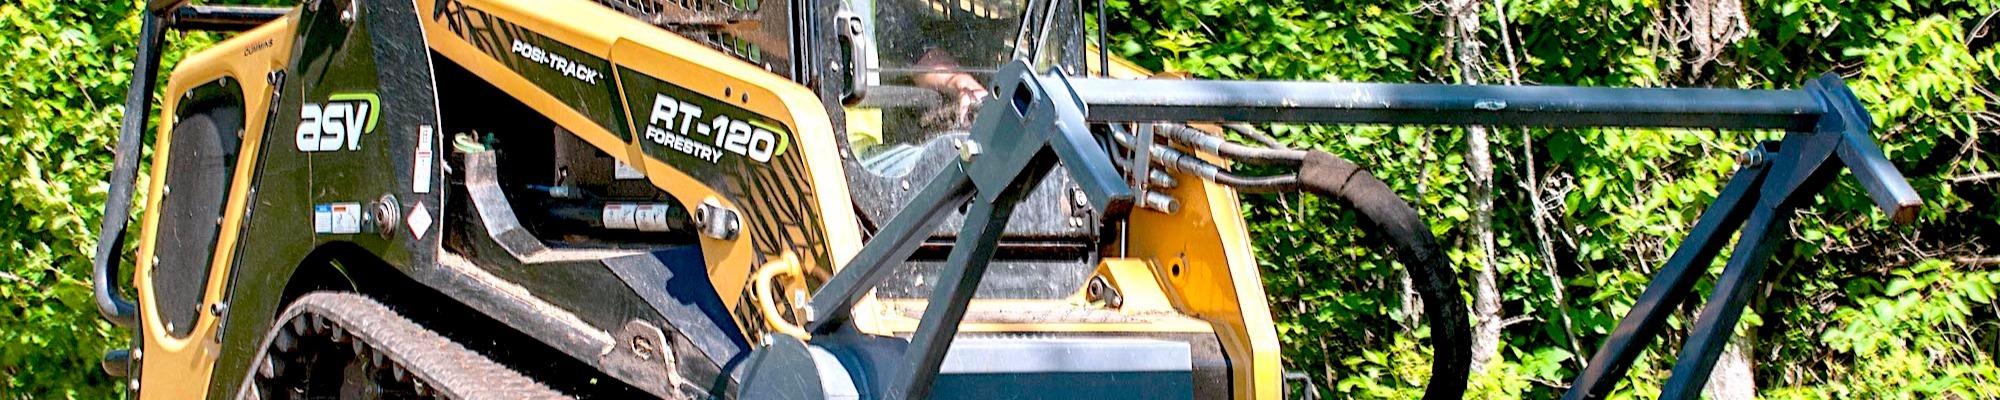 Forestry & Logging Equipment Skid Steer Loaders ASV RT-120 Machines